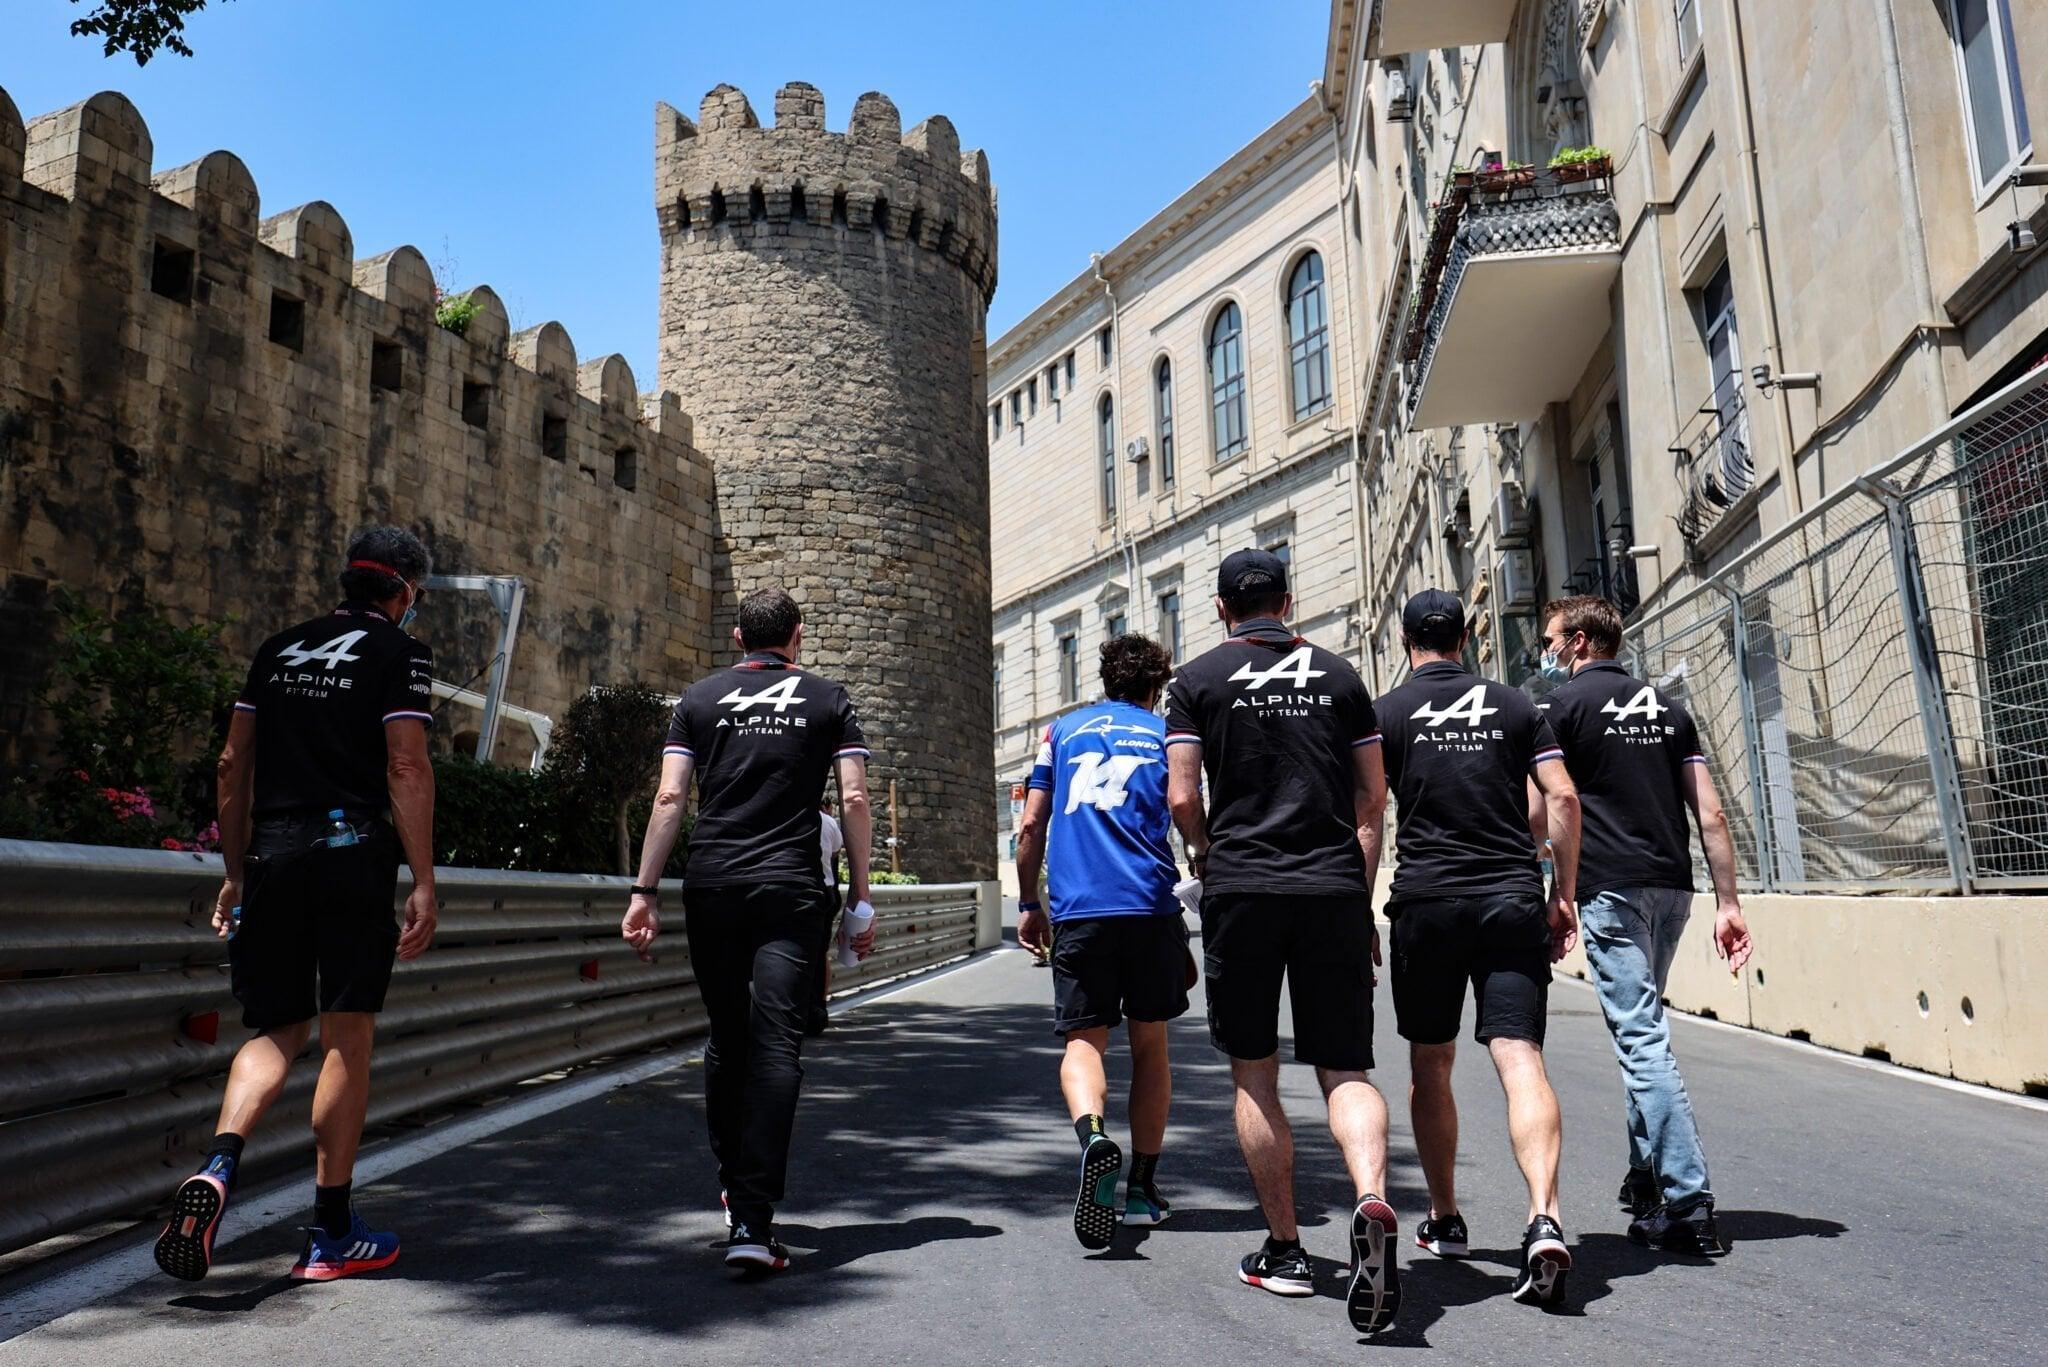 Alpine F1 Azebaijan Grand Prix Baku Alonso Ocon 2021 60 | Alpine F1 entre en Q3 au Grand Prix d'Azerbaïdjan / Baku 2021